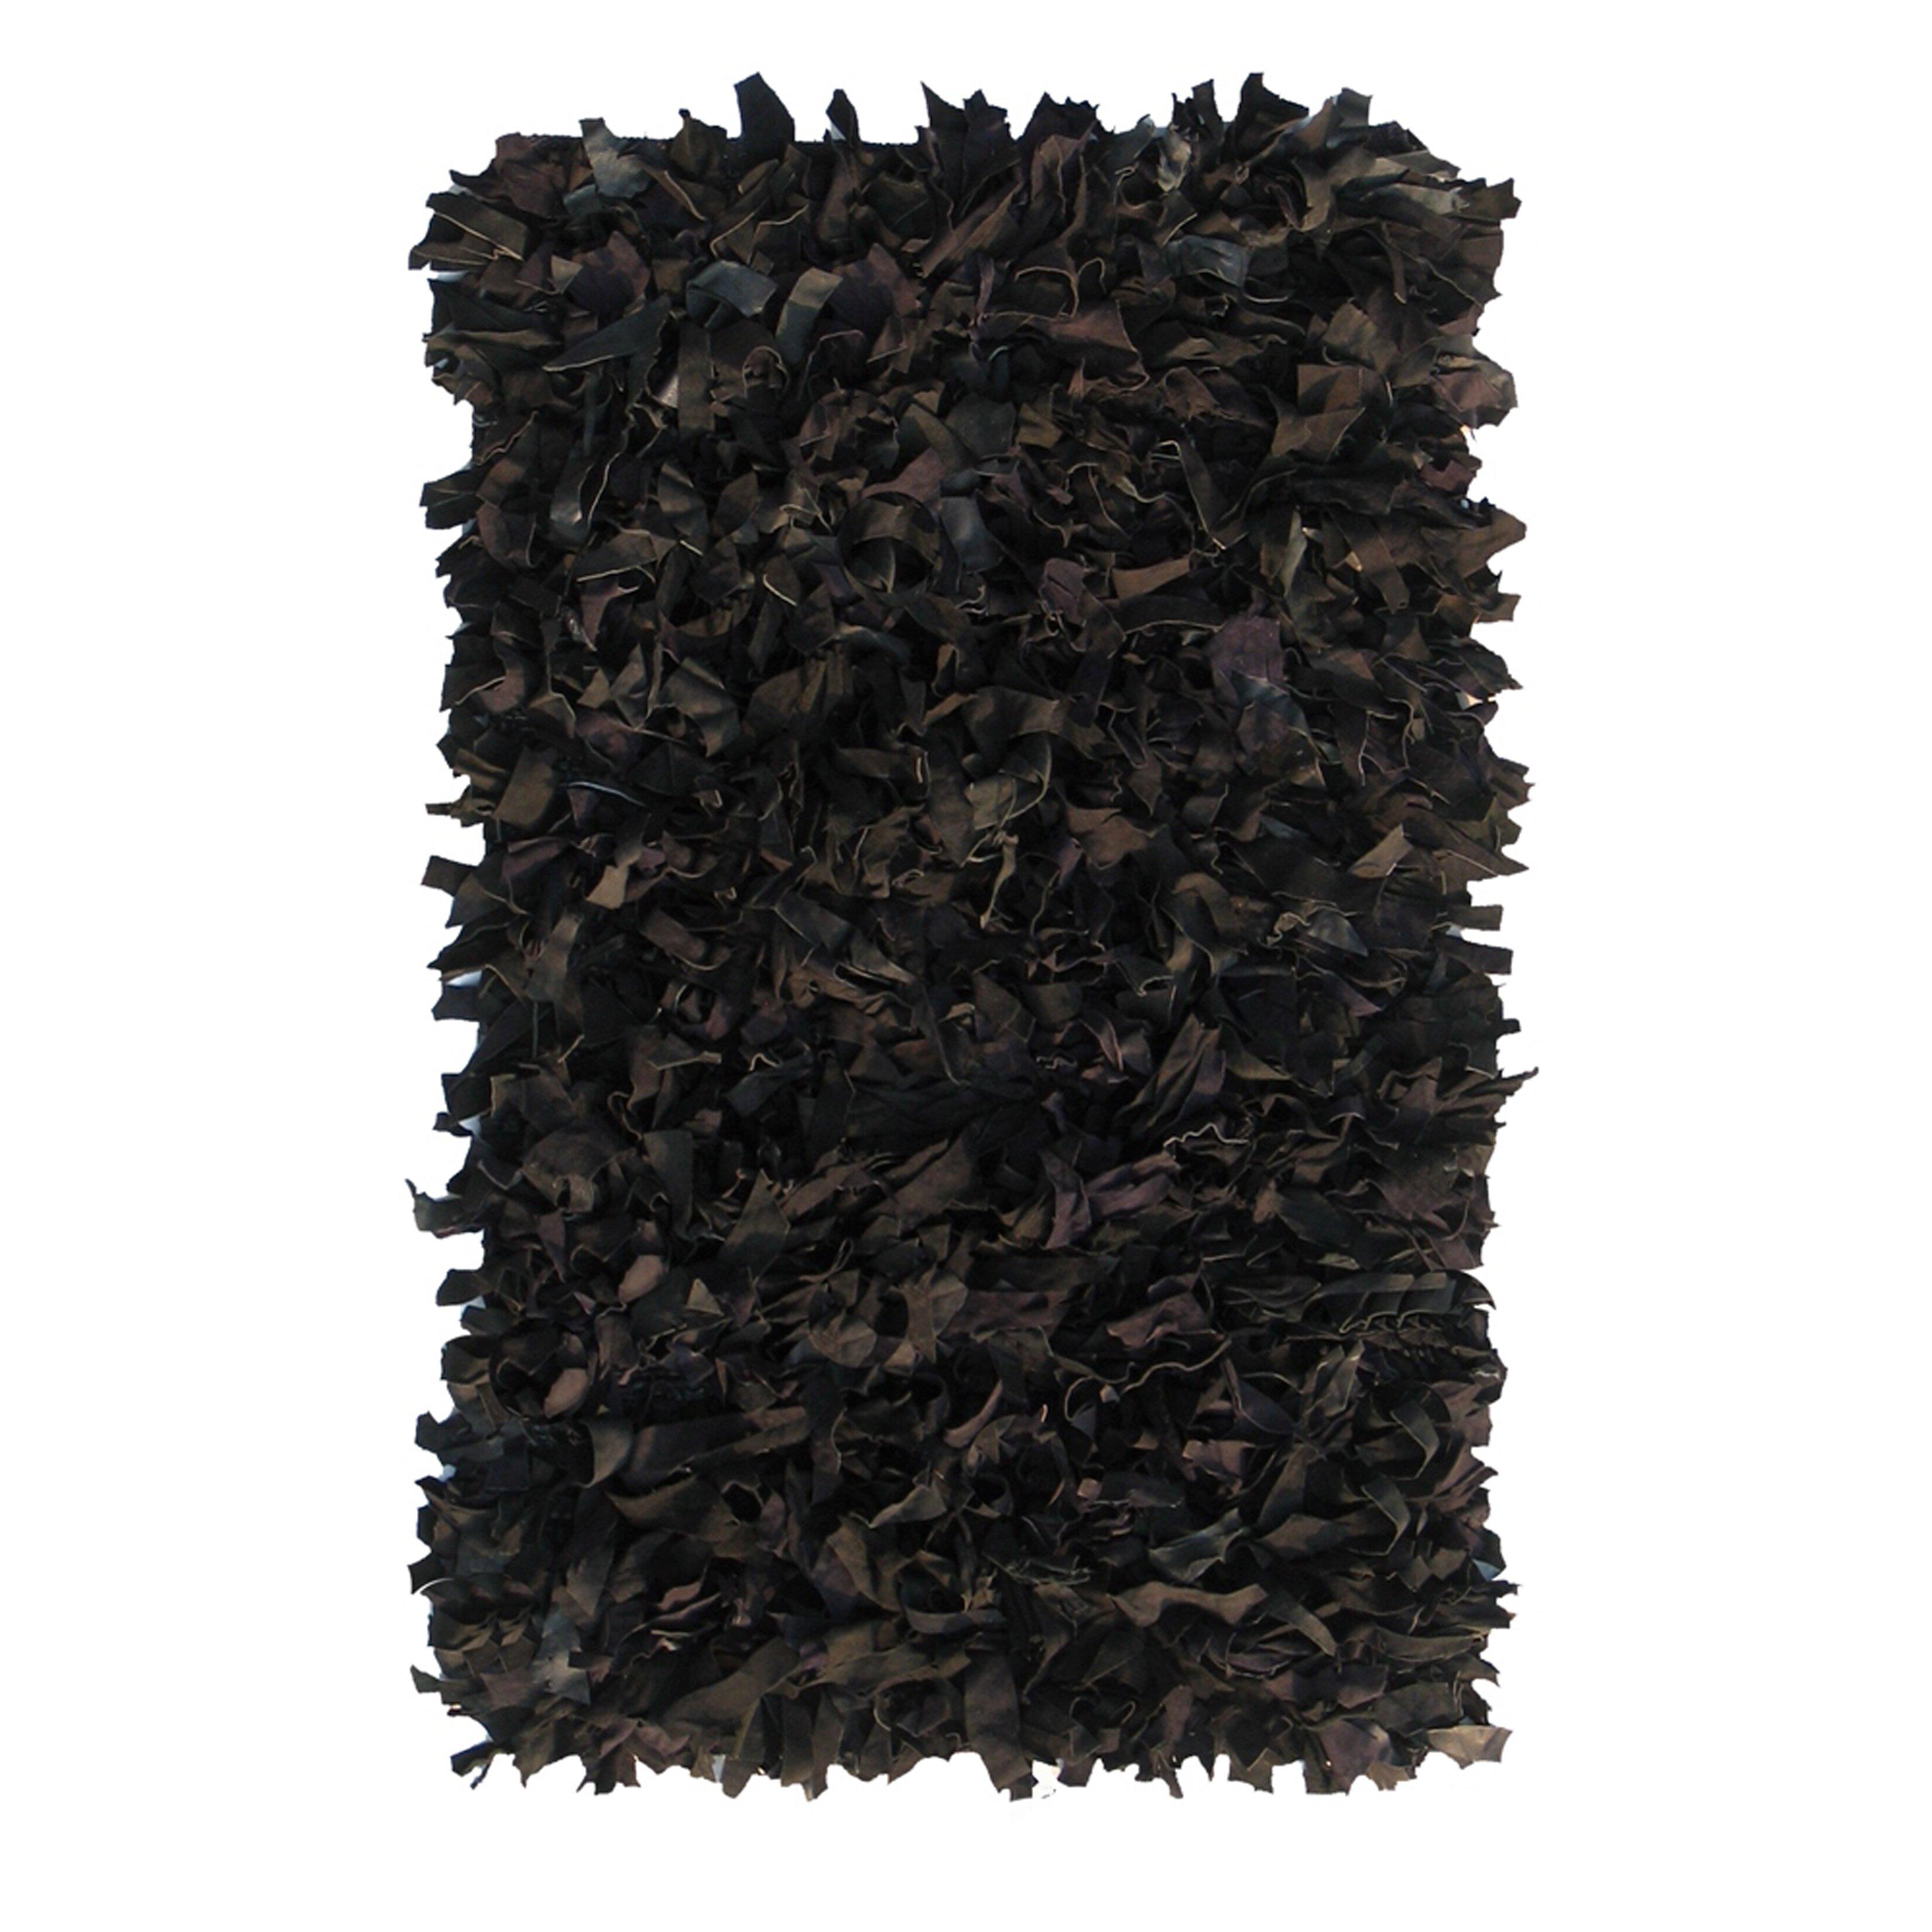 Nuloom Leather Shag Woven Black Area Rug Reviews Wayfair